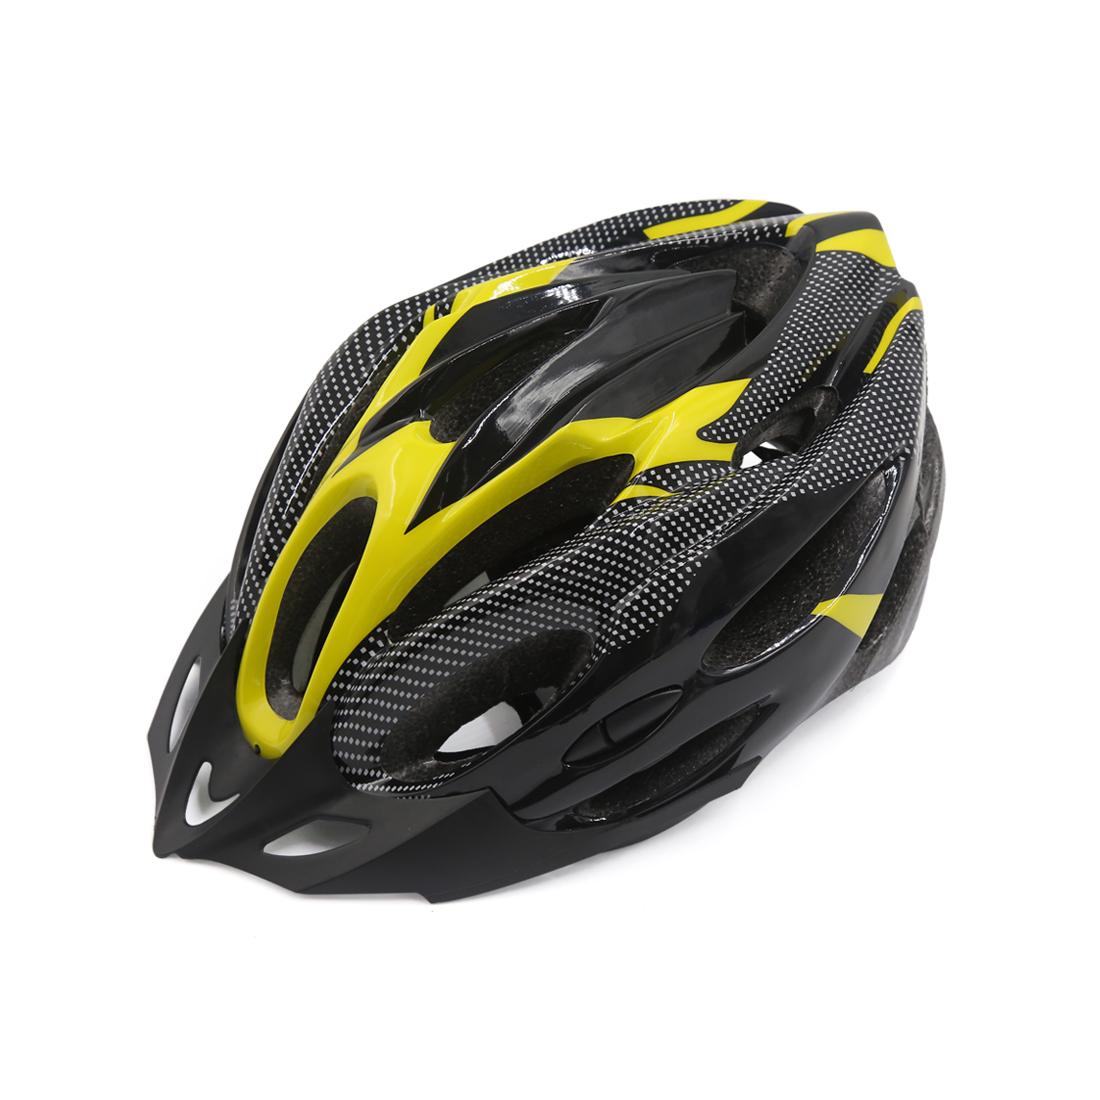 Carbon Fiber Pattern 21 Holes Cycling Bicycle Soprt Bike Helmet Visor Yellow